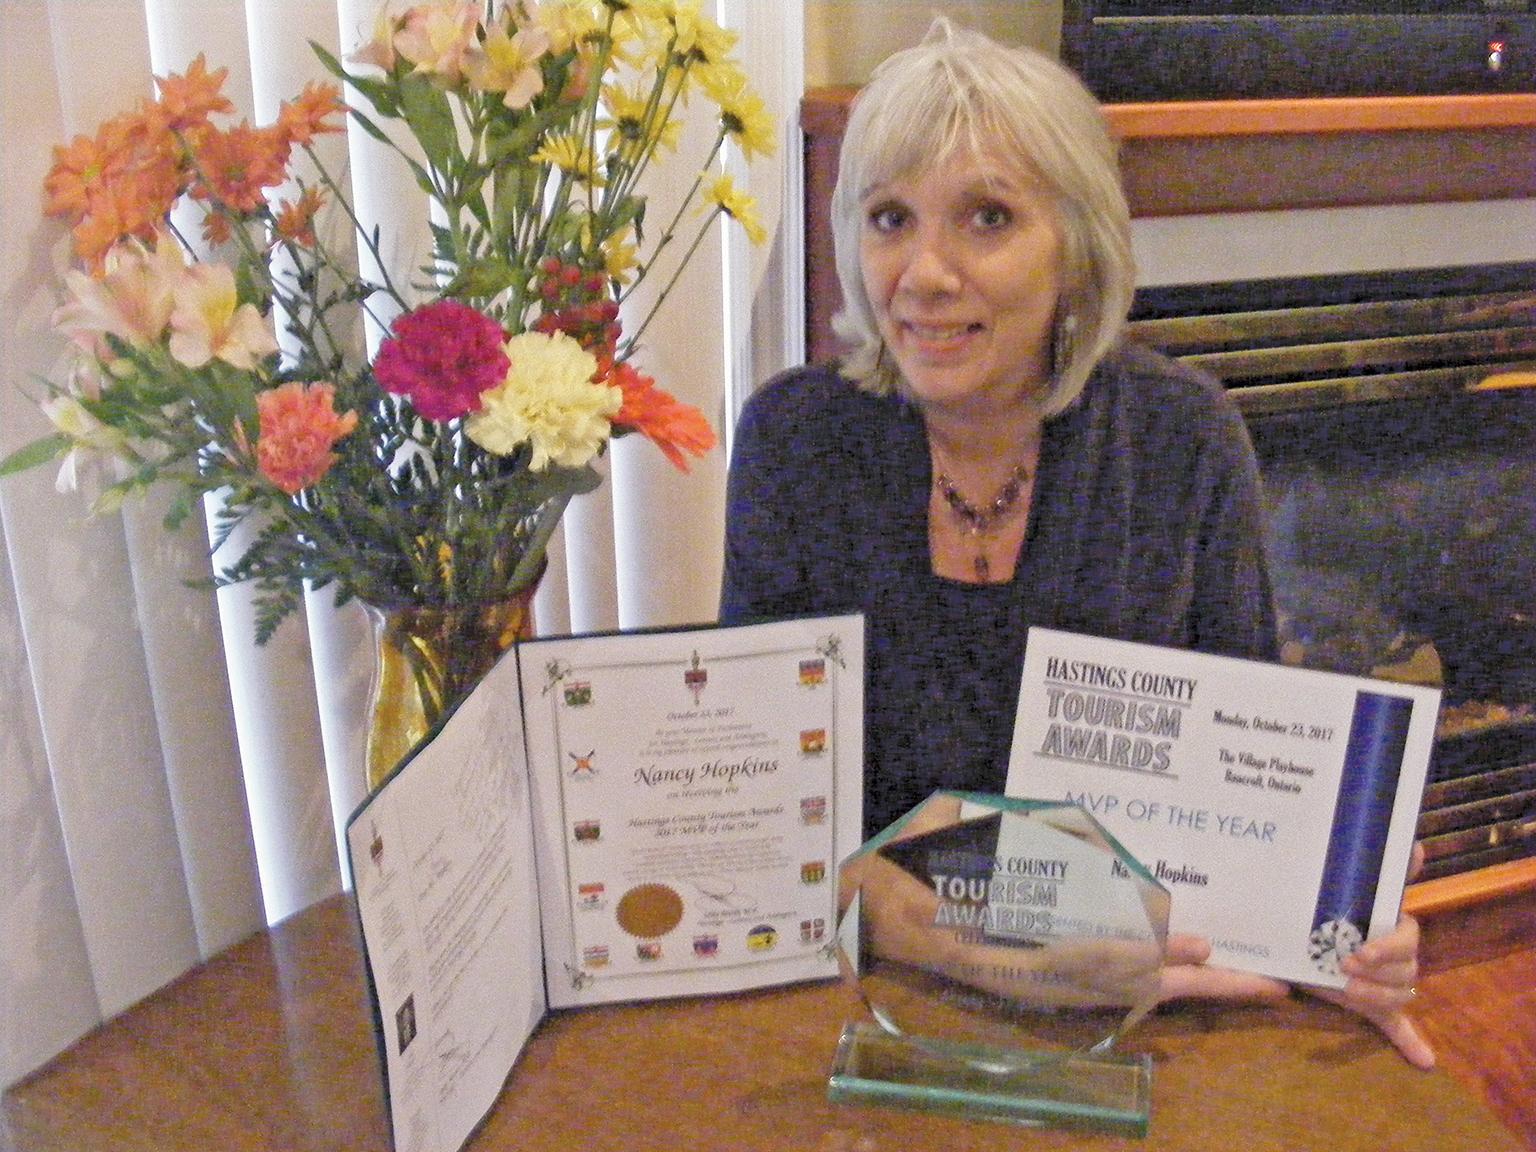 Country Roads Publisher, Nancy Hopkins